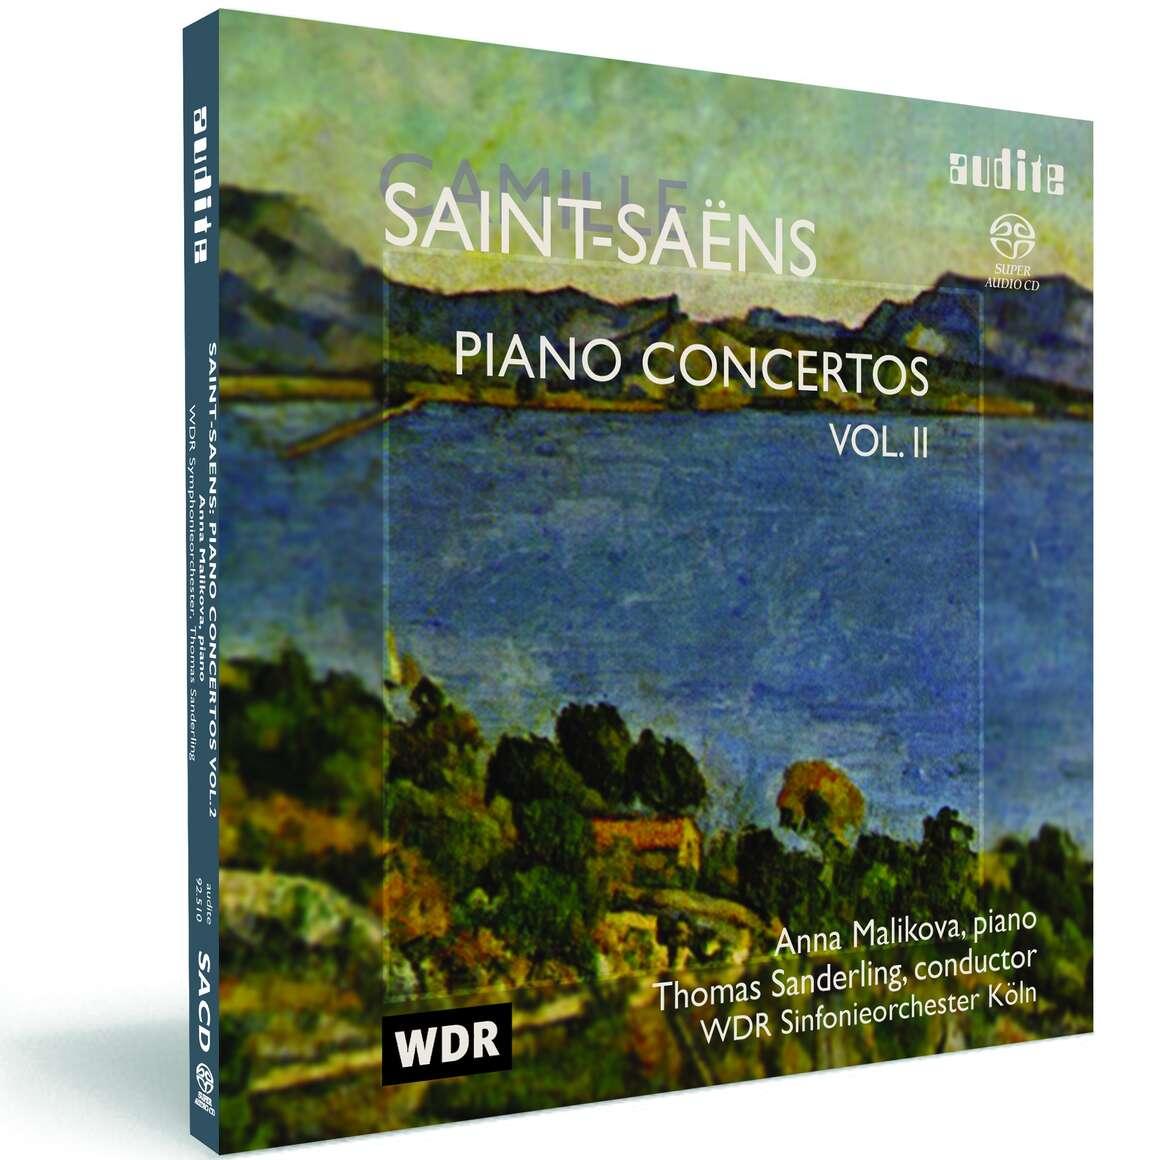 C. Saint-Saëns: Piano Concertos Vol. II